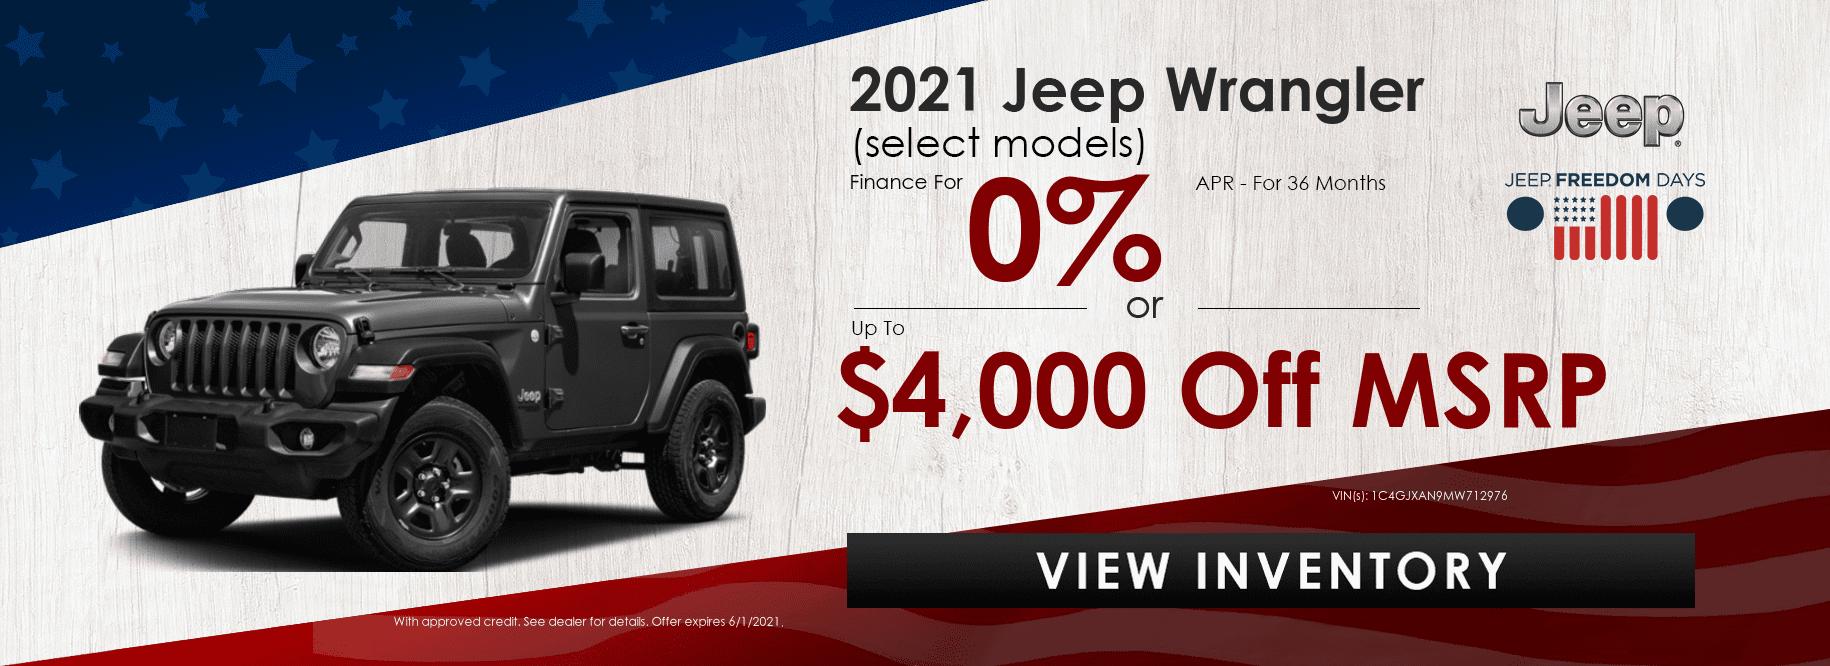 2021-Jeep-Wrangler-(select-models)-38